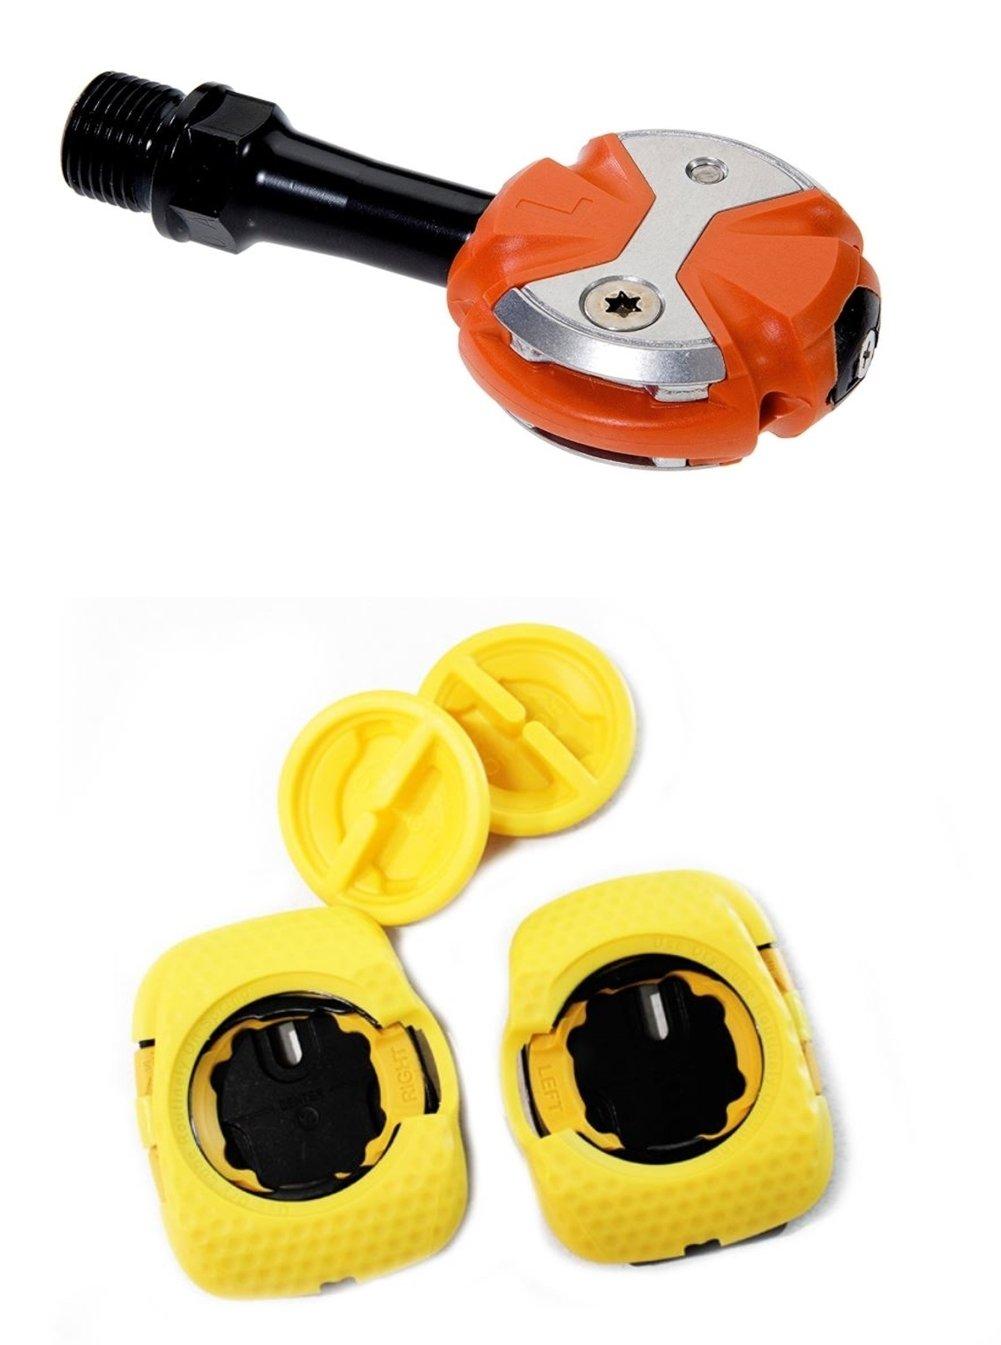 SPEEDPLAY(スピードプレイ) ZERO(ゼロ) クロモリペダル 限定オレンジ ウォーカブルクリートセット 0905-02-61255   B01N5EV7NY